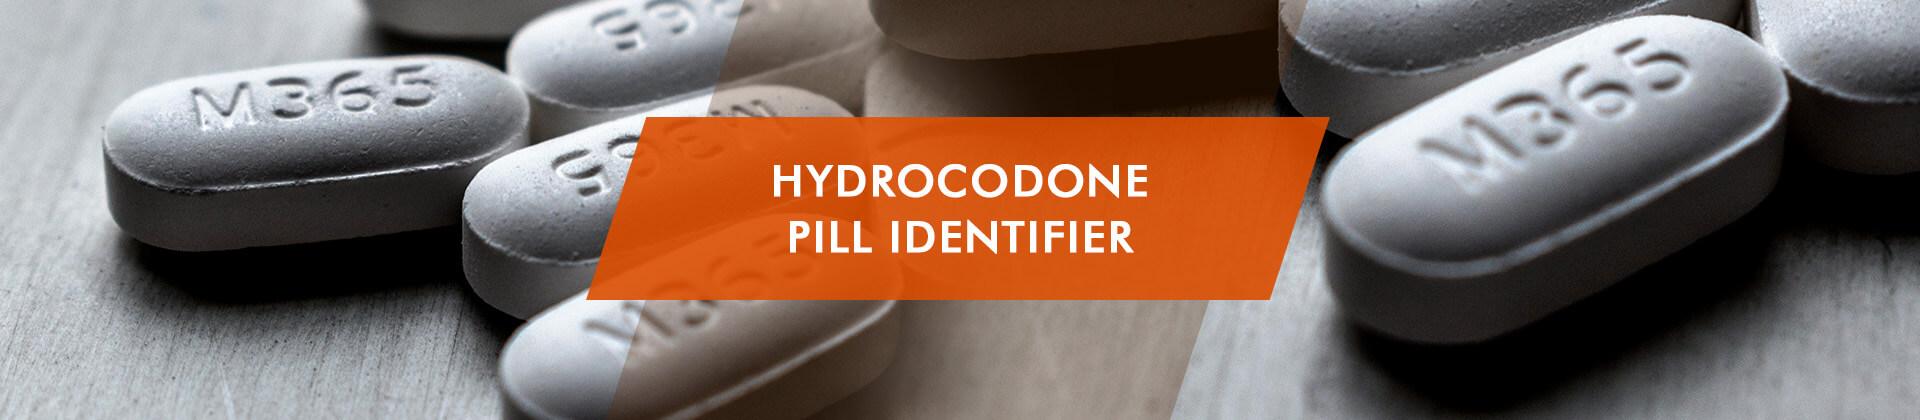 Hydrocodone Pill Identifier Orange White Blue And Pink Capsules